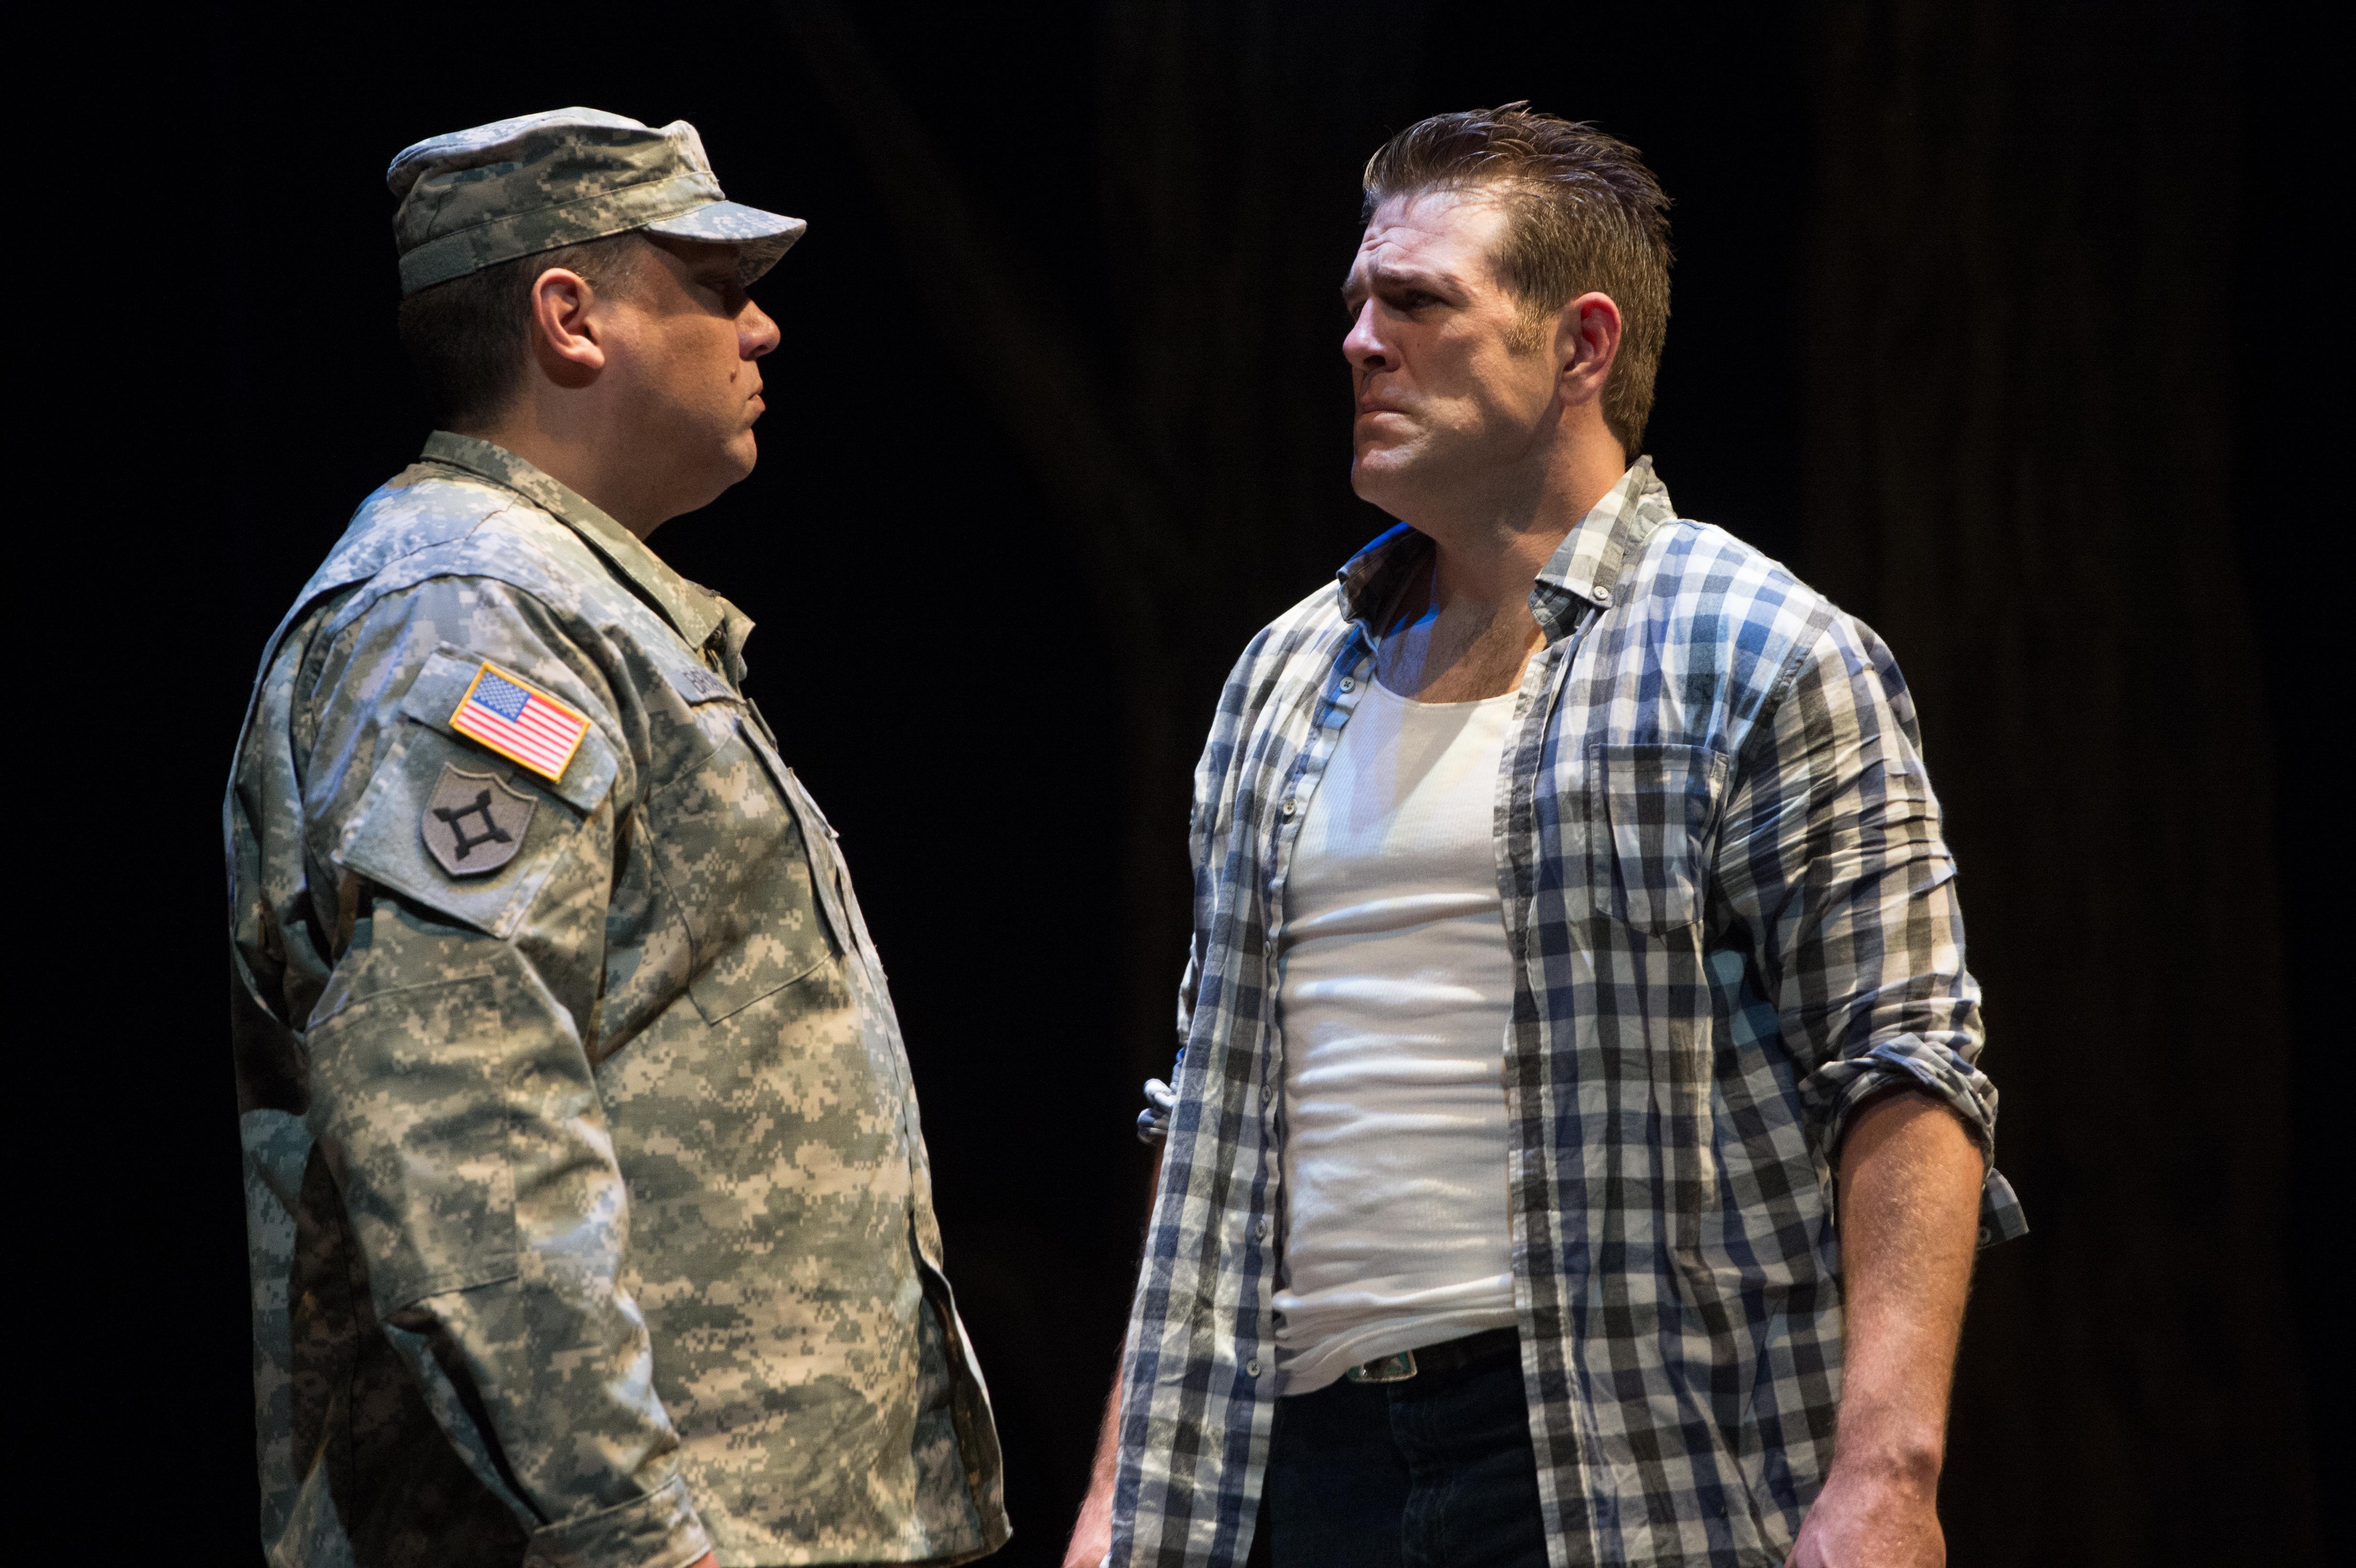 Frmr Oregon National Guardsman SFC Sean Davis as Sgt Bryan and Michael Mayes as Adam. Photo: Jenny Graham/Anima Mundi Productions.